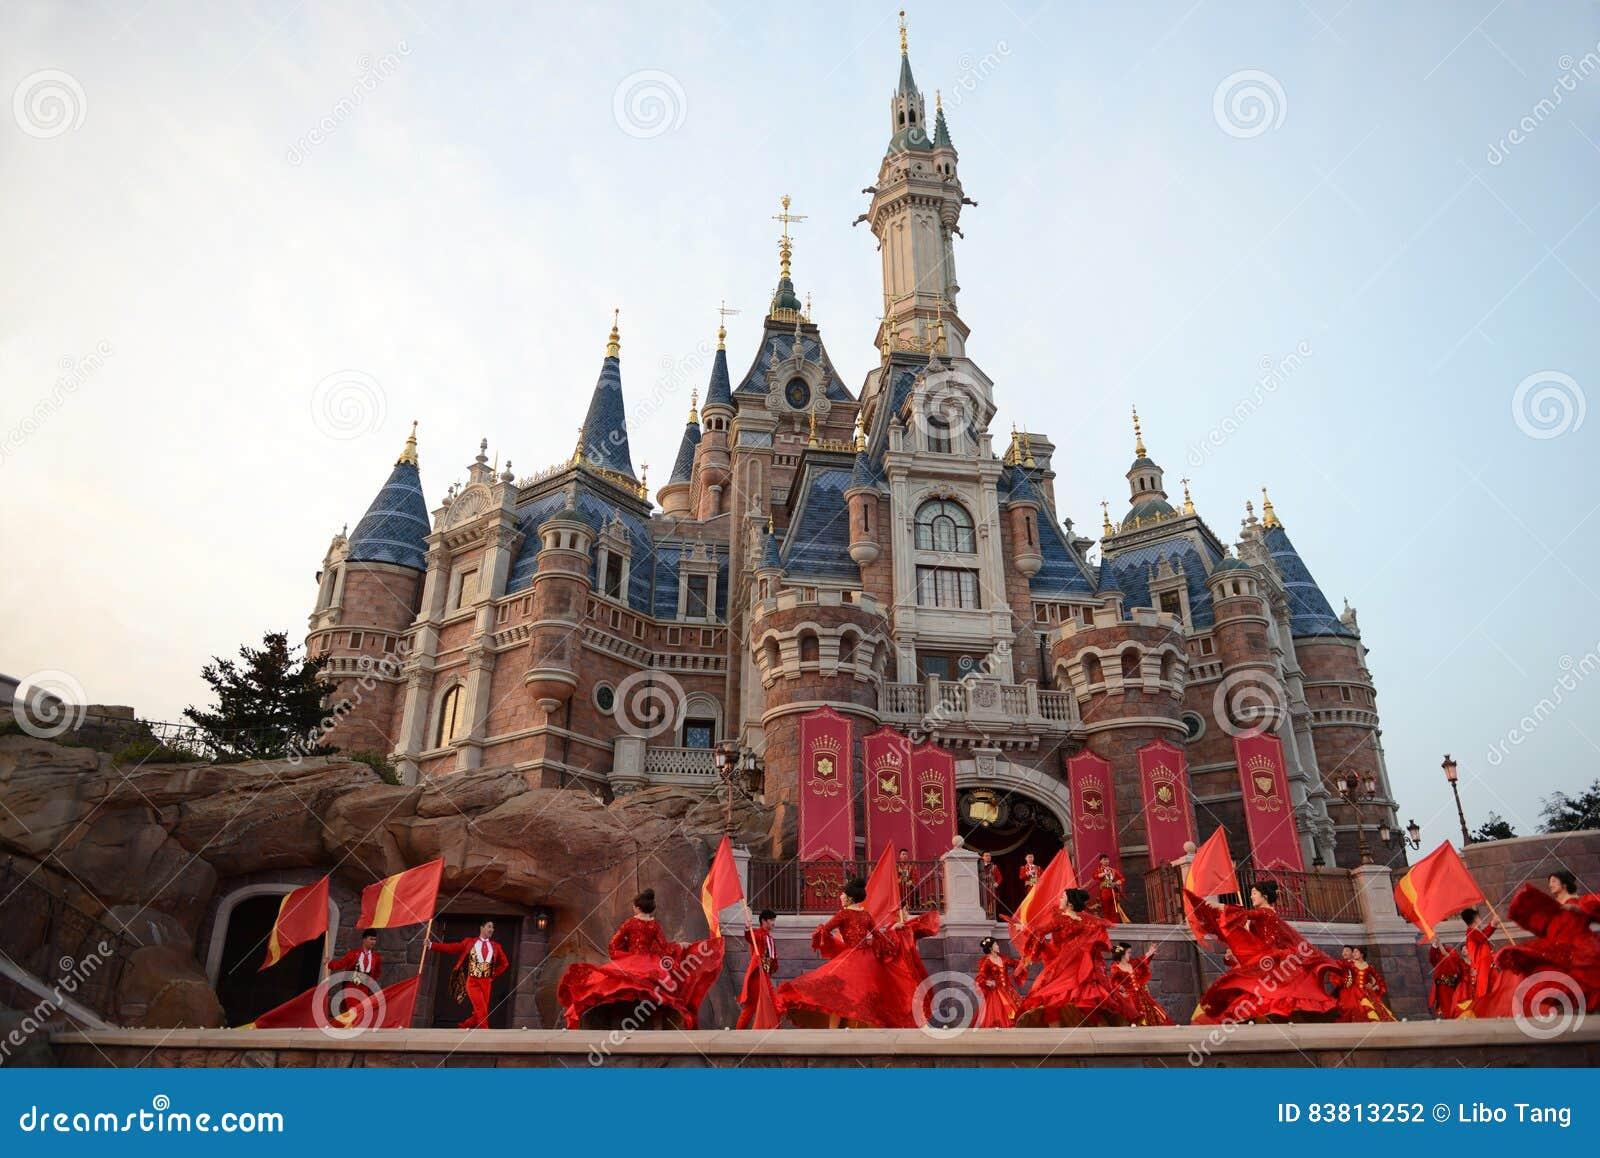 disney castle in shanghai editorial photography image of cartoon